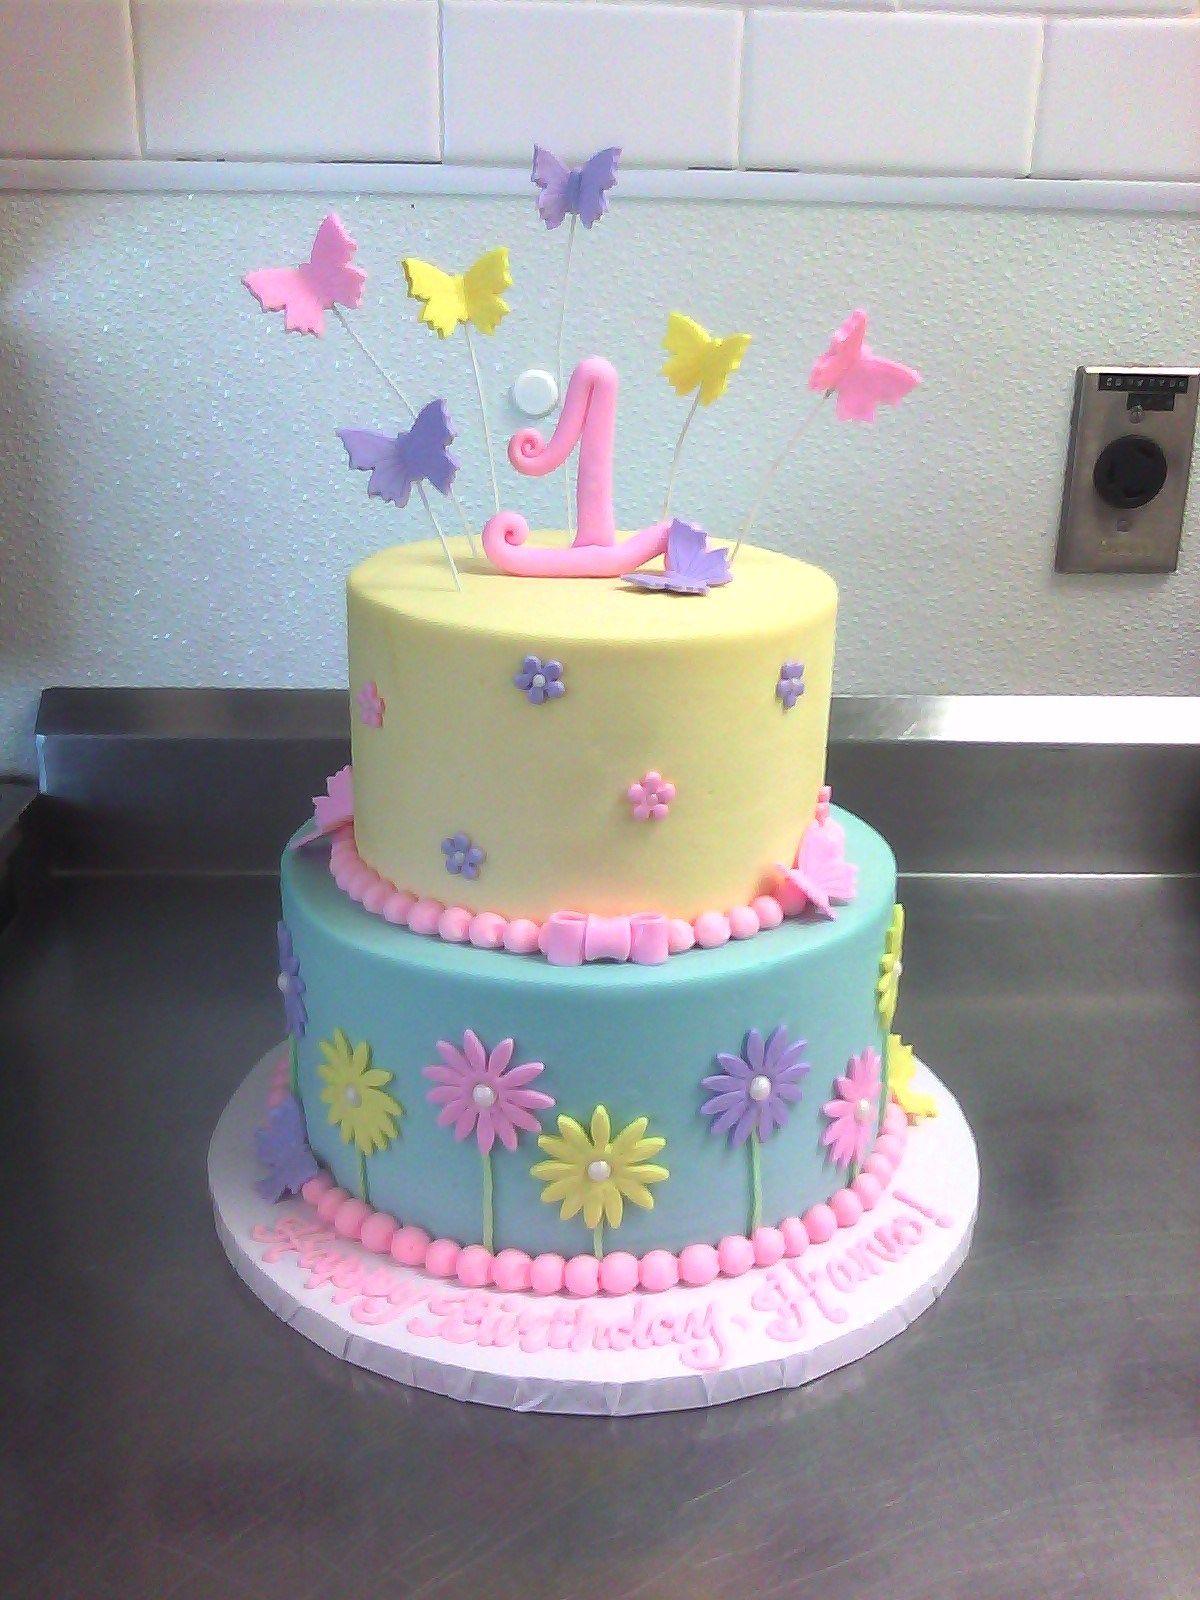 Heb Cakes Custom : cakes, custom, Birthday, Imogi, Cakes, Girls, Photo, Happy, Albanysinsanity.com, Girls,, Cakes,, First